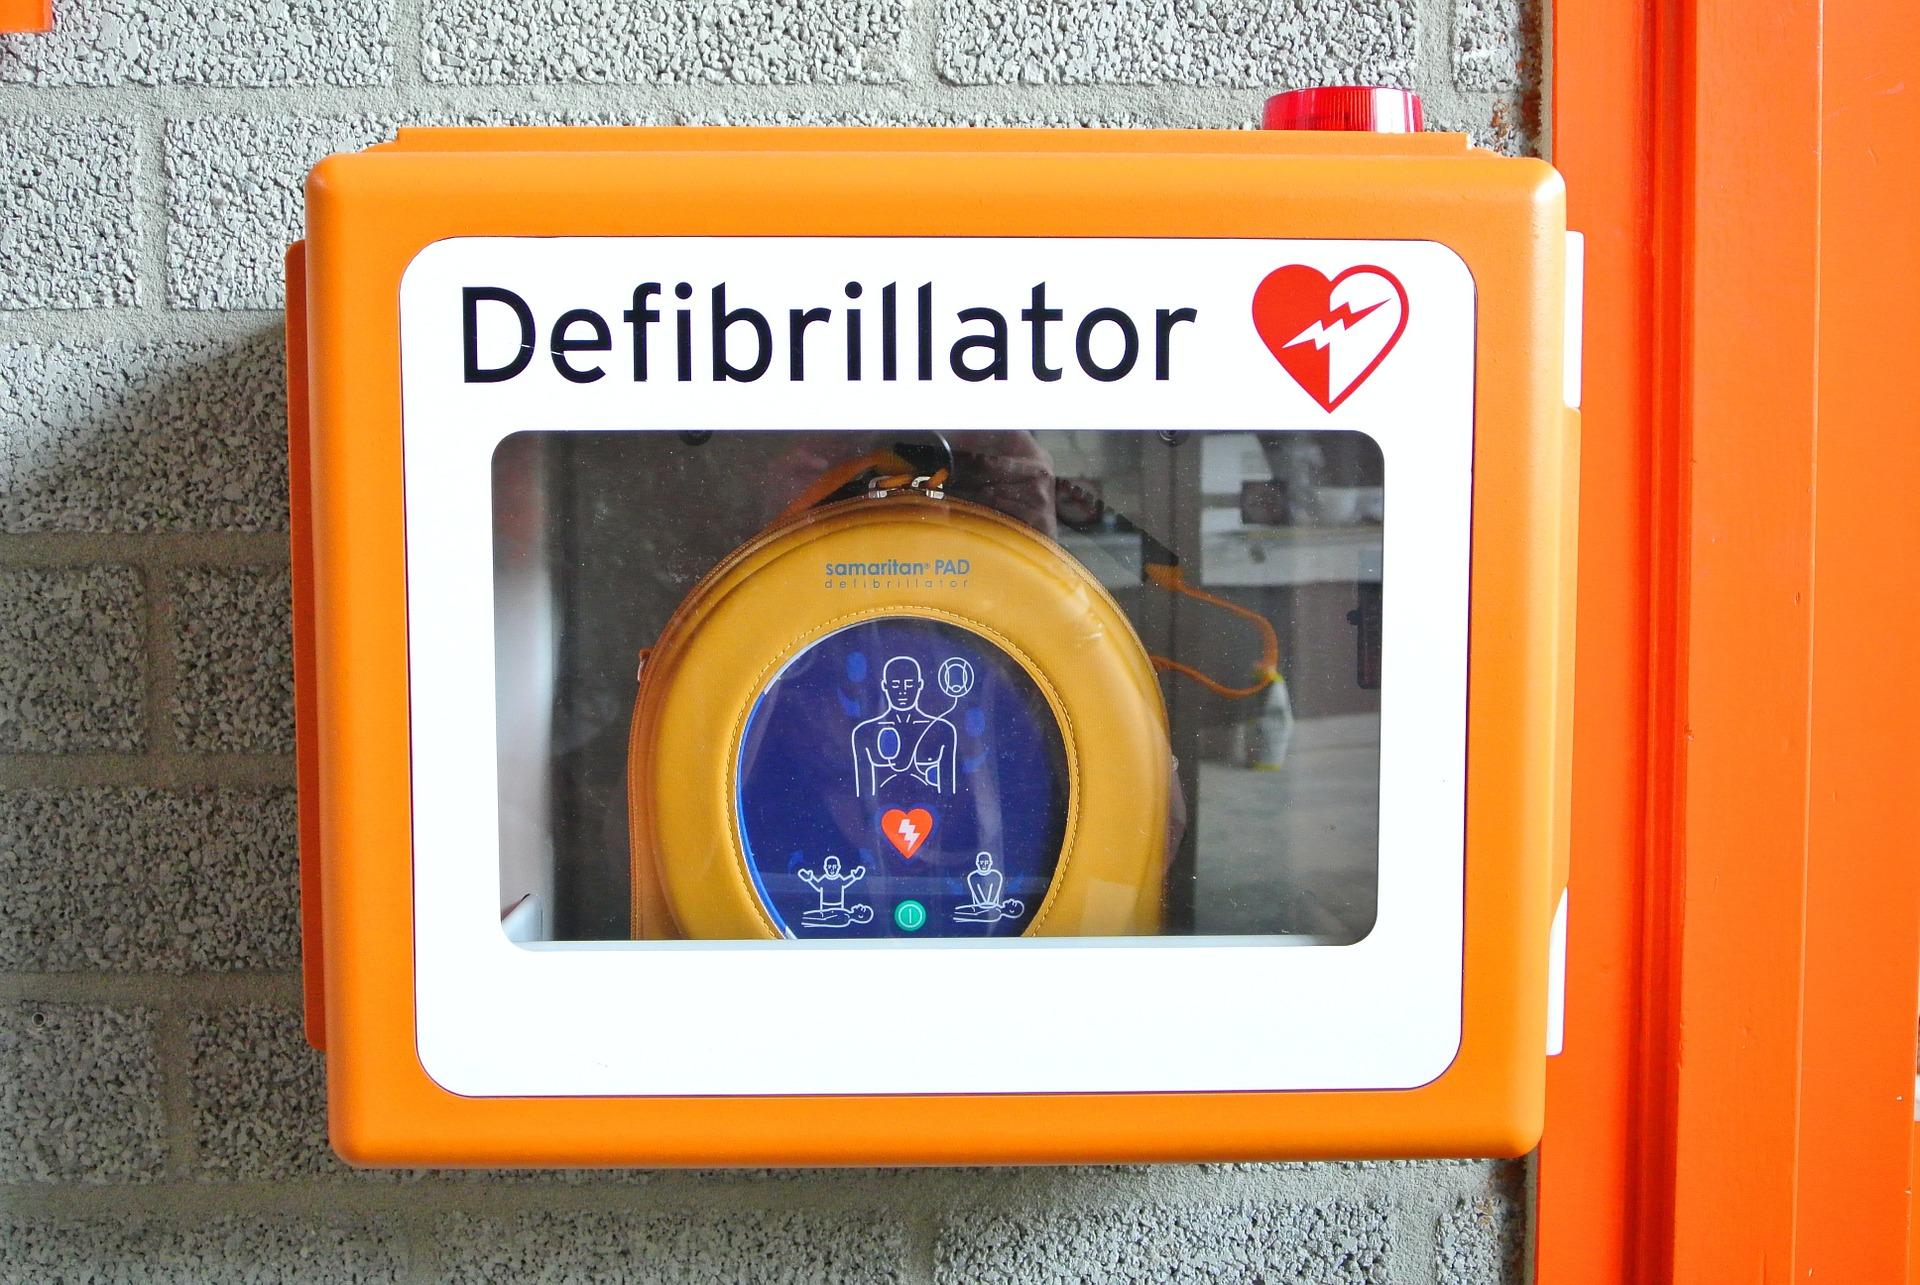 defibrillator-